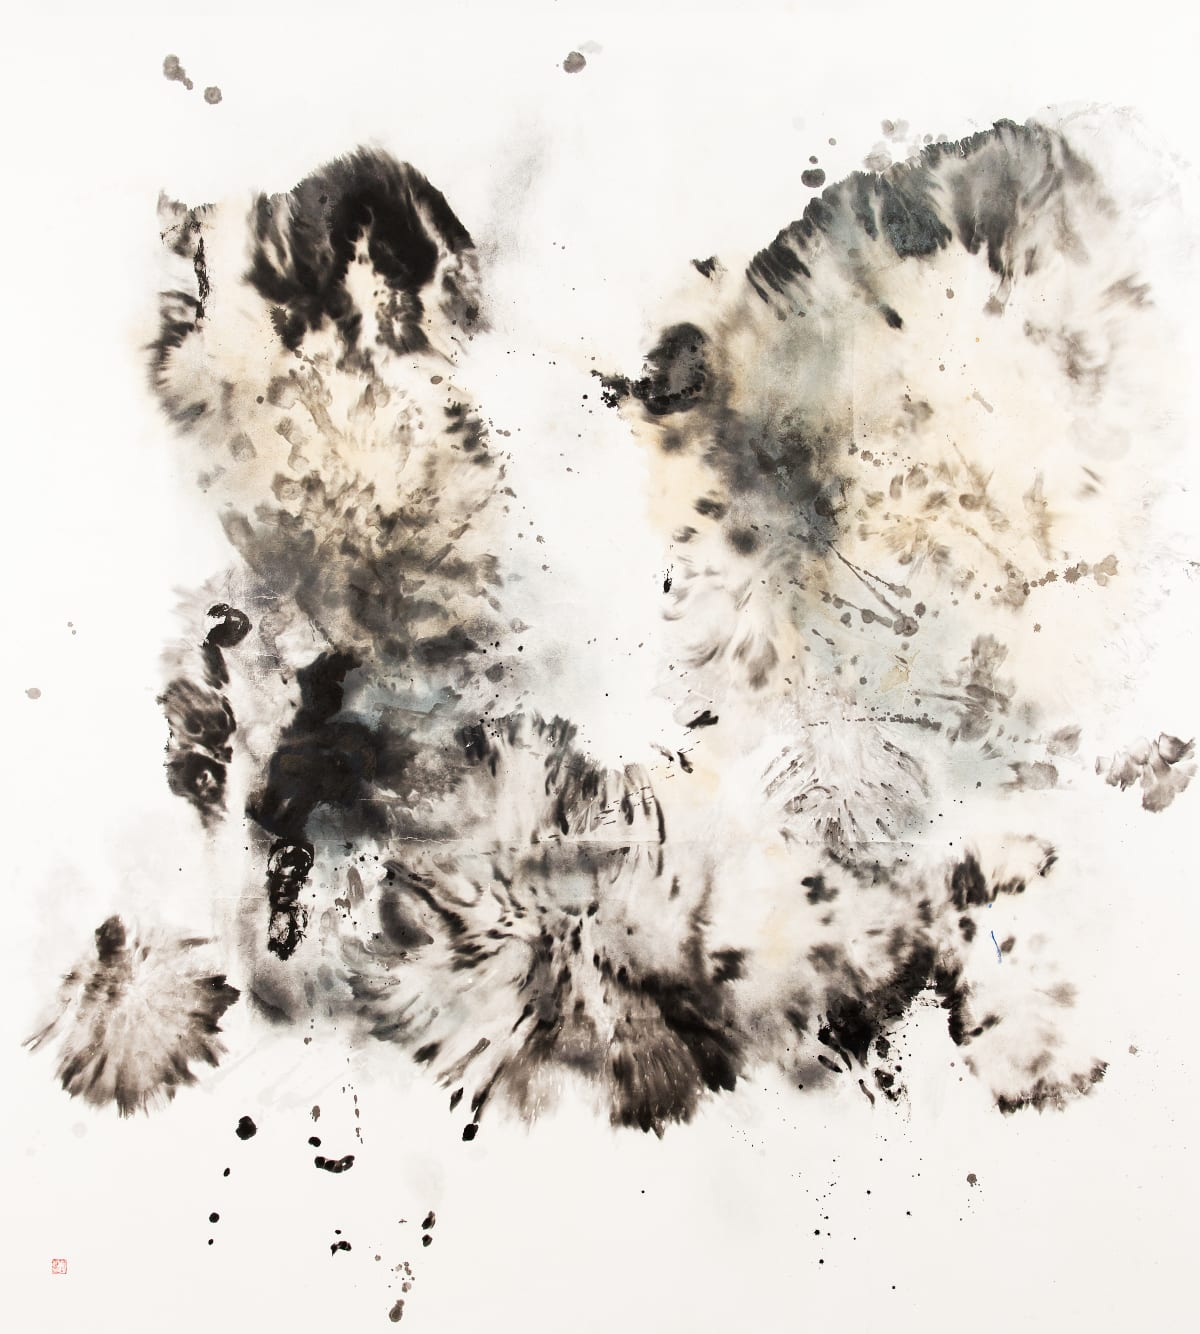 Chloe Ho 何鳳蓮, Feline Fortune, 2014